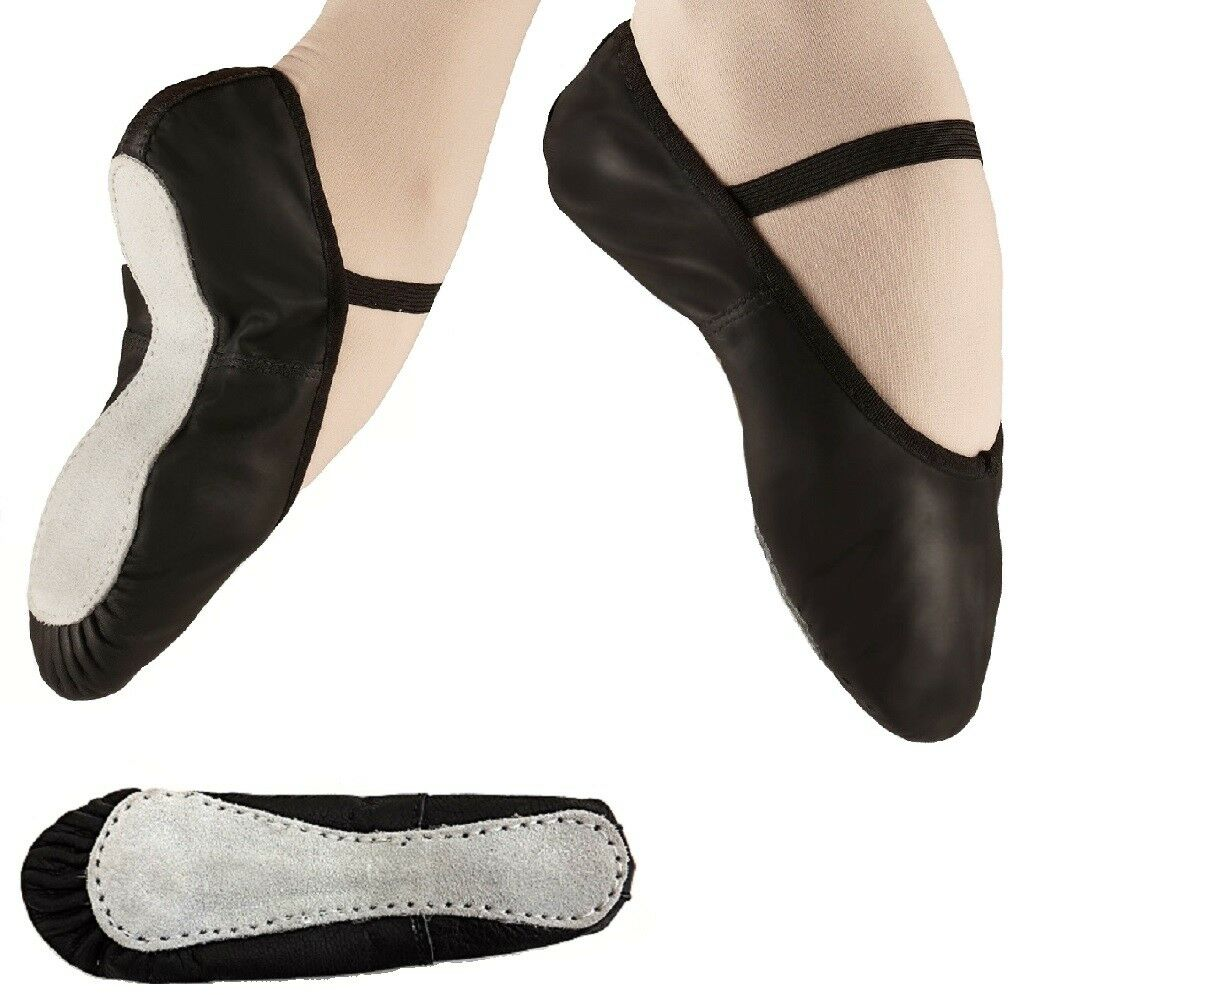 Leather Black Ballet Shoes Full Sole UK Sizes